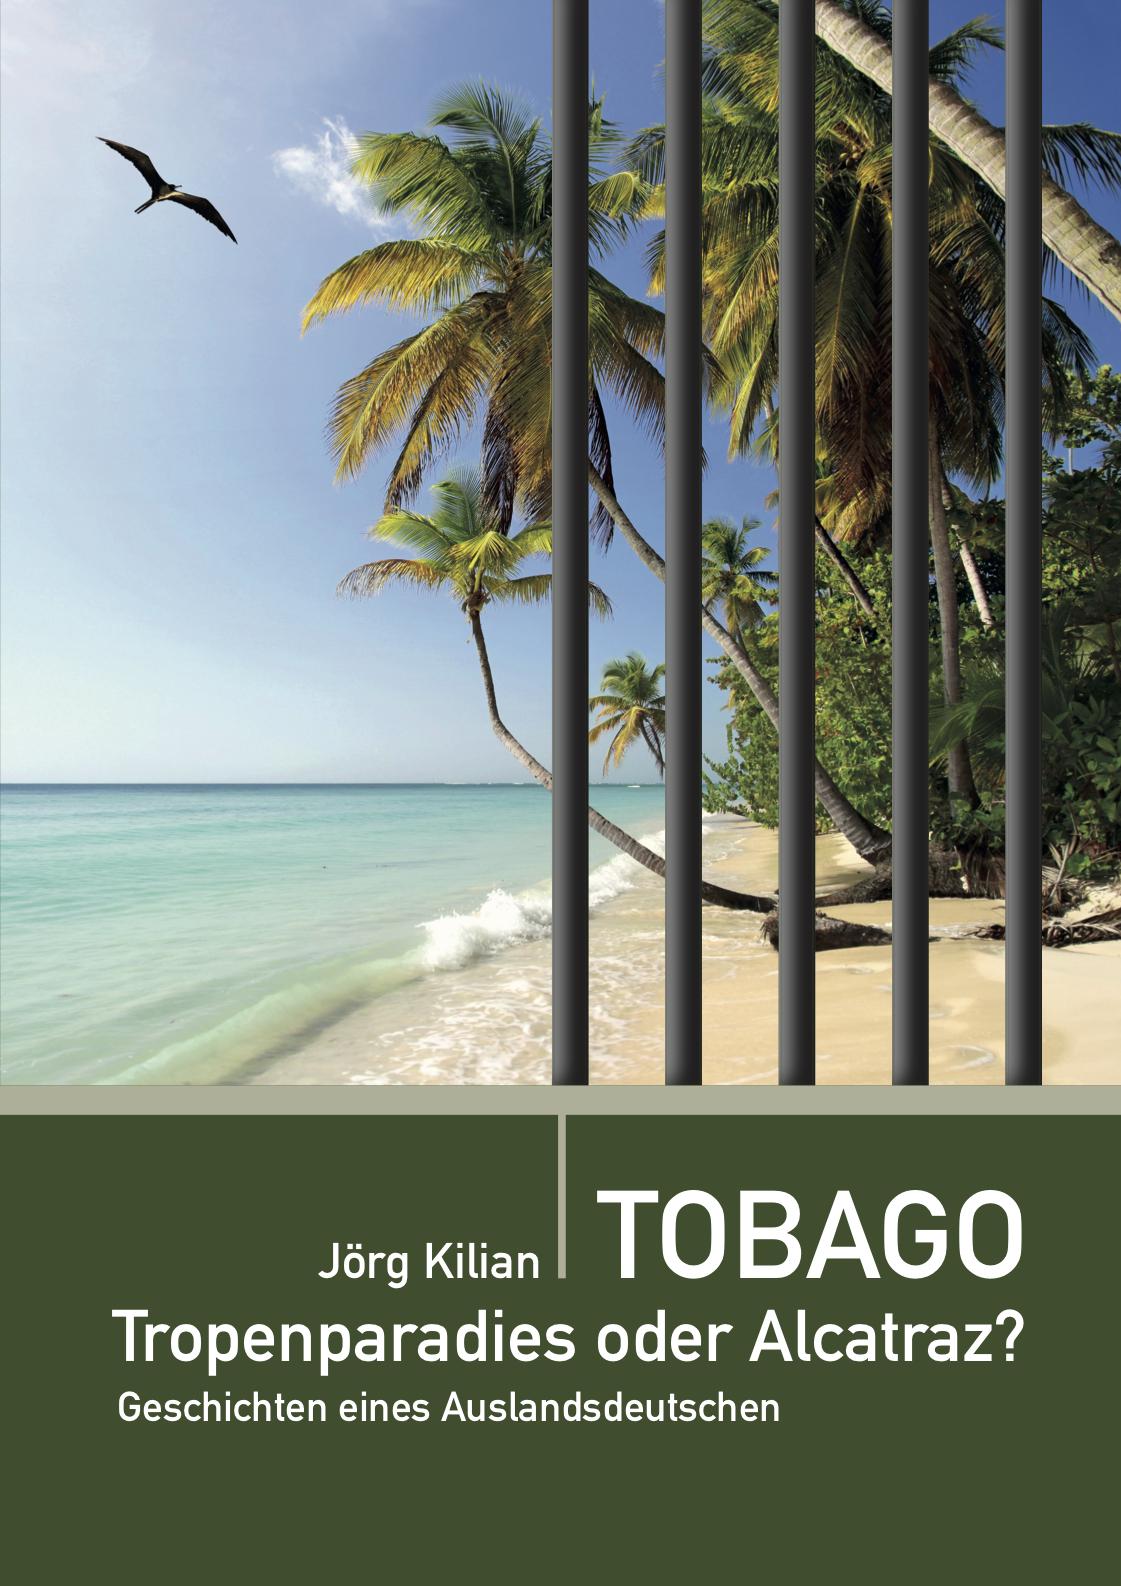 Jörg Kilian: TOBAGO. Tropenparadies oder Alcatraz?